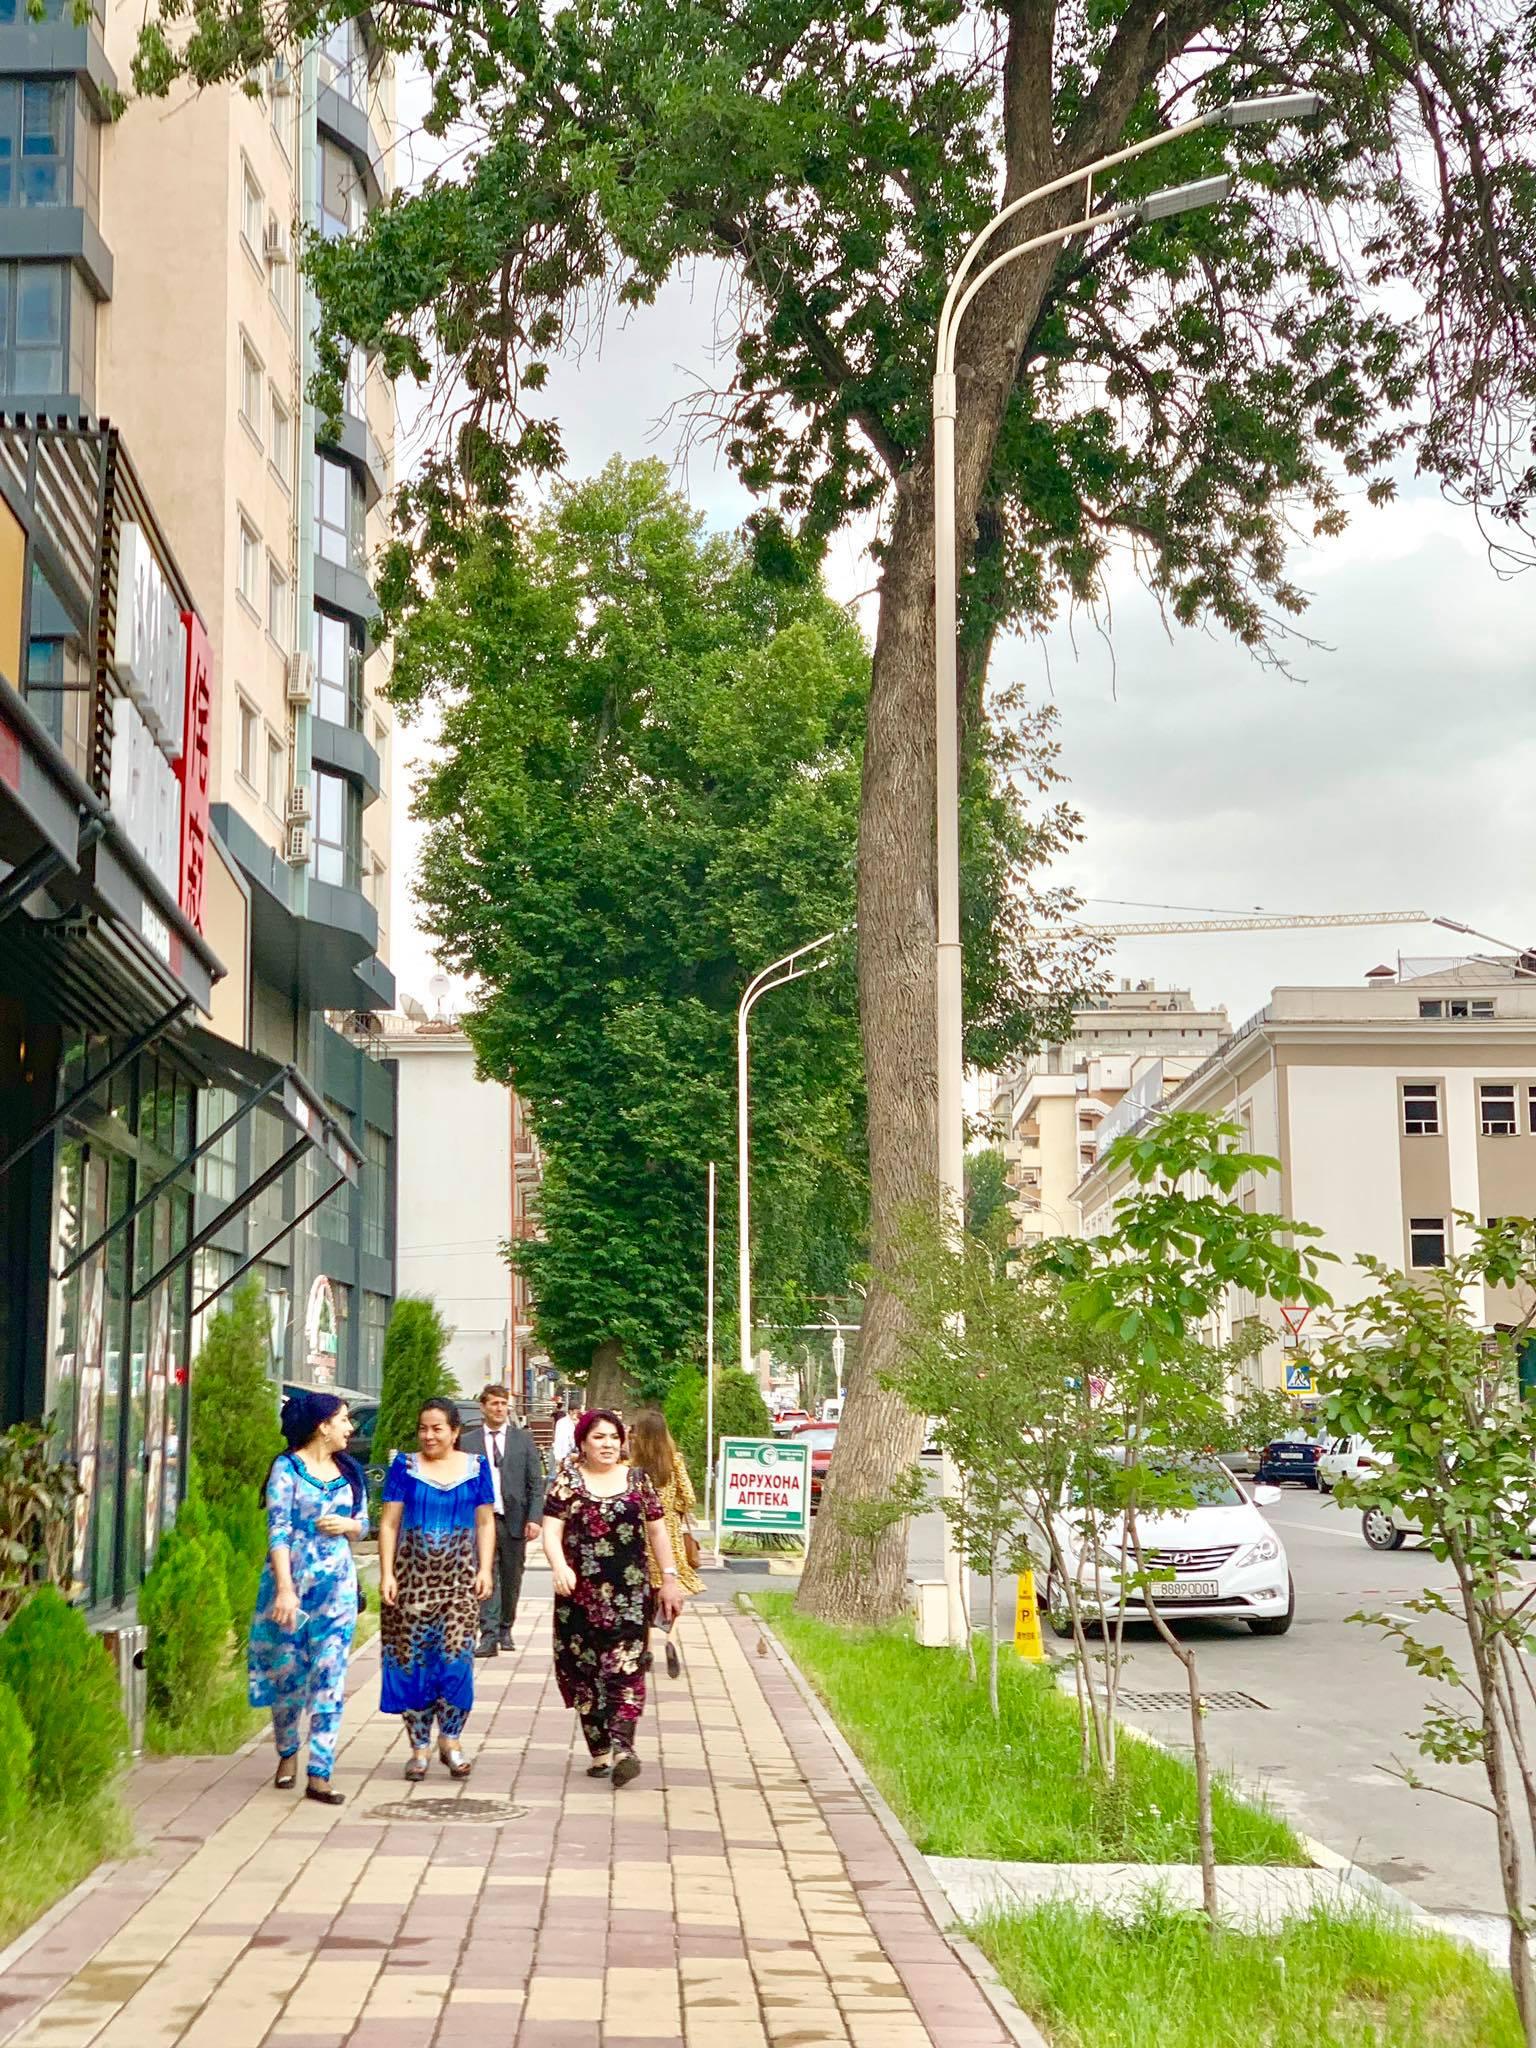 Kach Solo Travels in 2019 I just arrived in Dushanbe, Tajikistan14.jpg